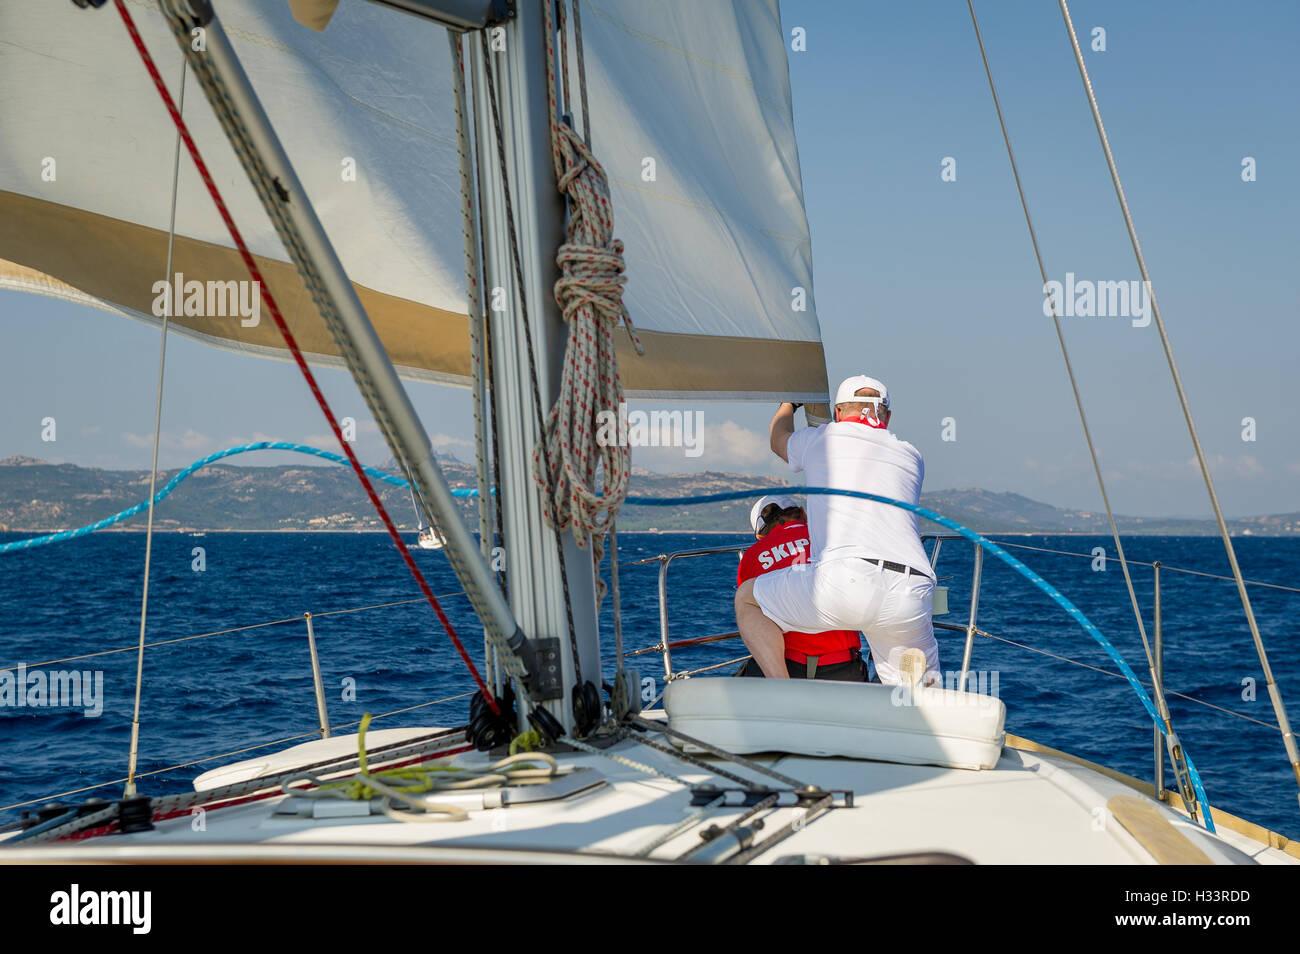 Crew work at sailing race. - Stock Image